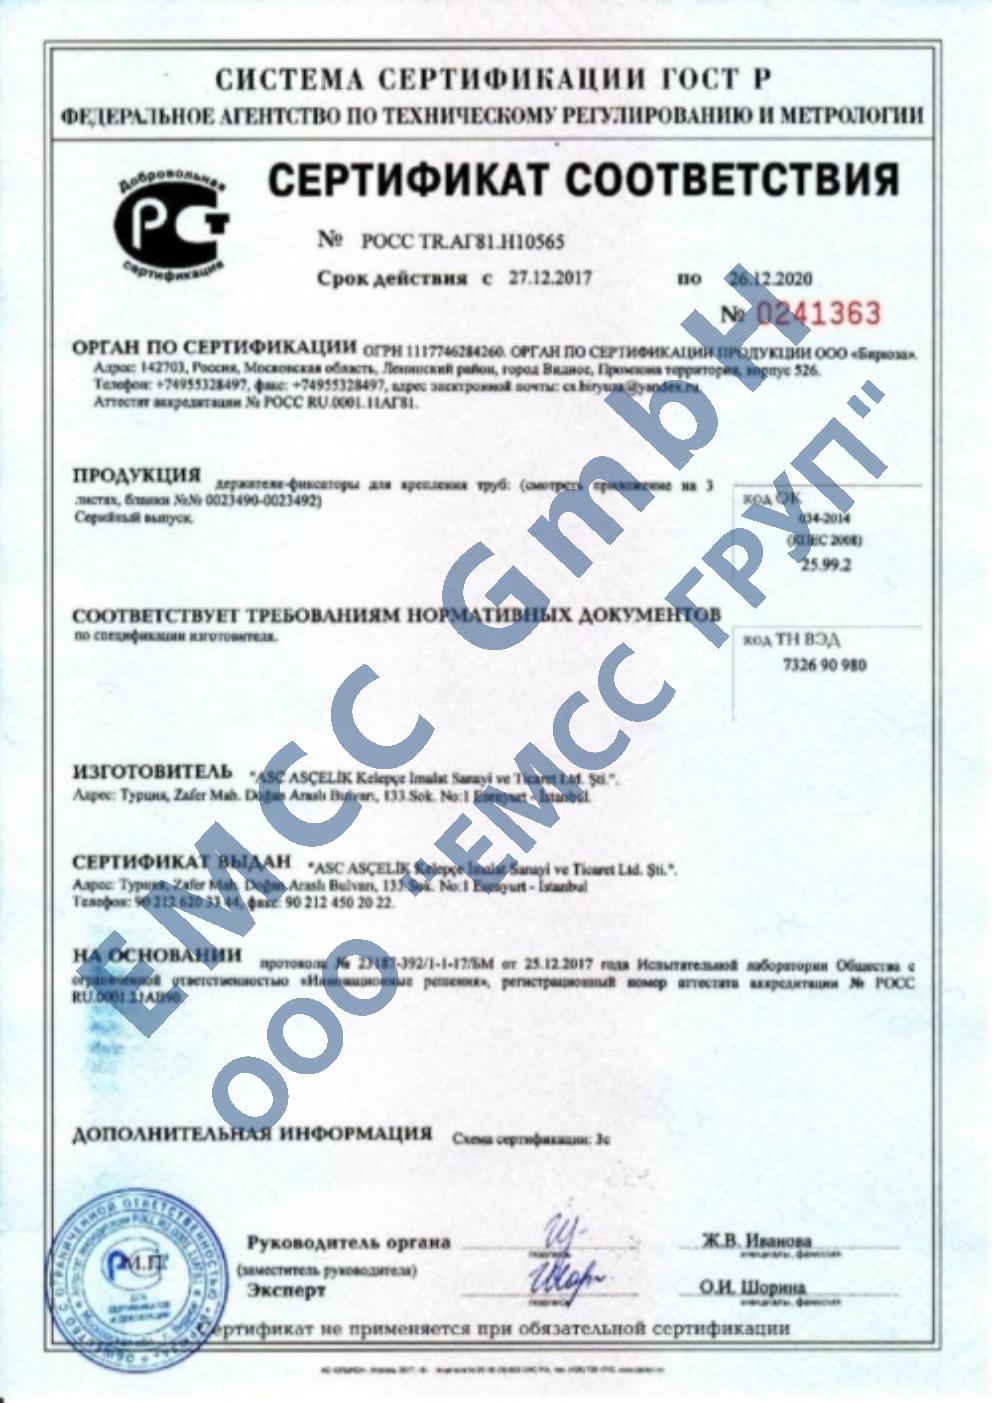 Russland GOST R Zertifikat. Antragsteller: EMCC GROUP Ltd.